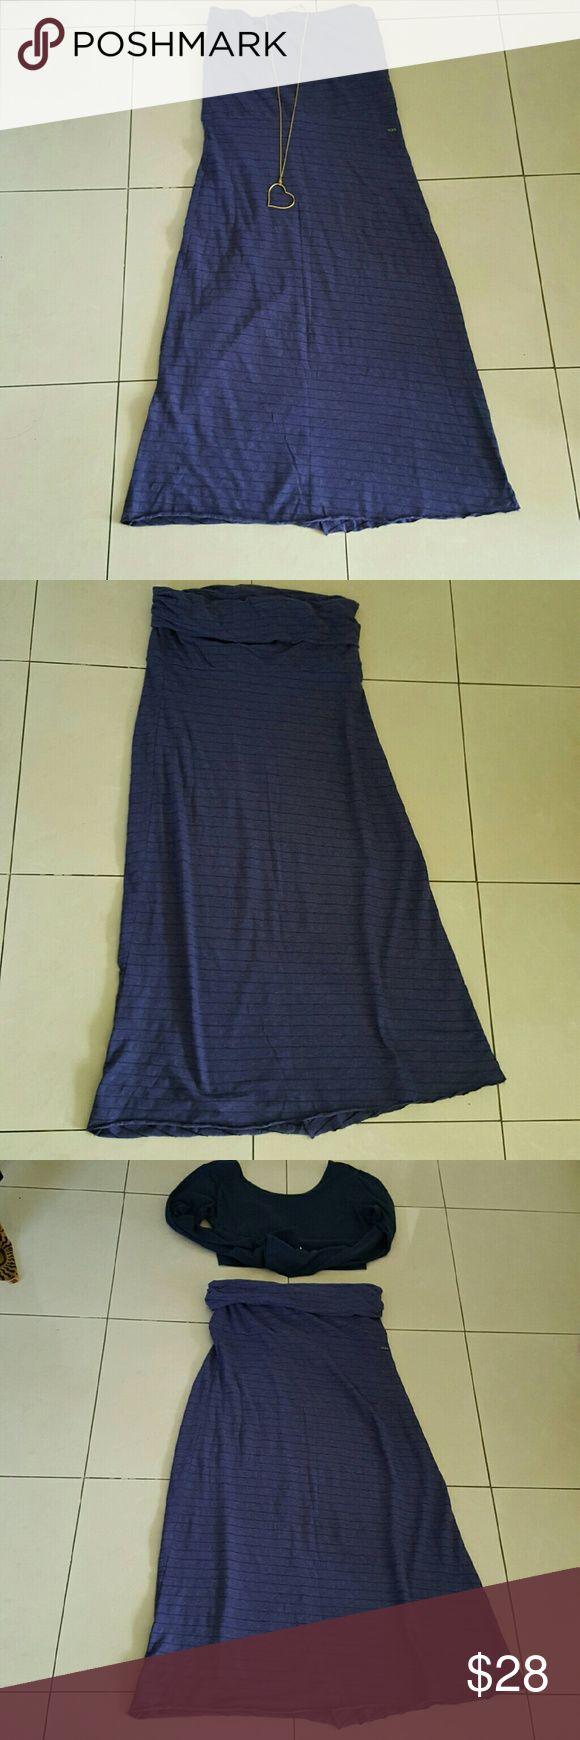 Roxy maxi skirt tube dress Mid length tube dress converts to maxi skirt Roxy Dresses Maxi